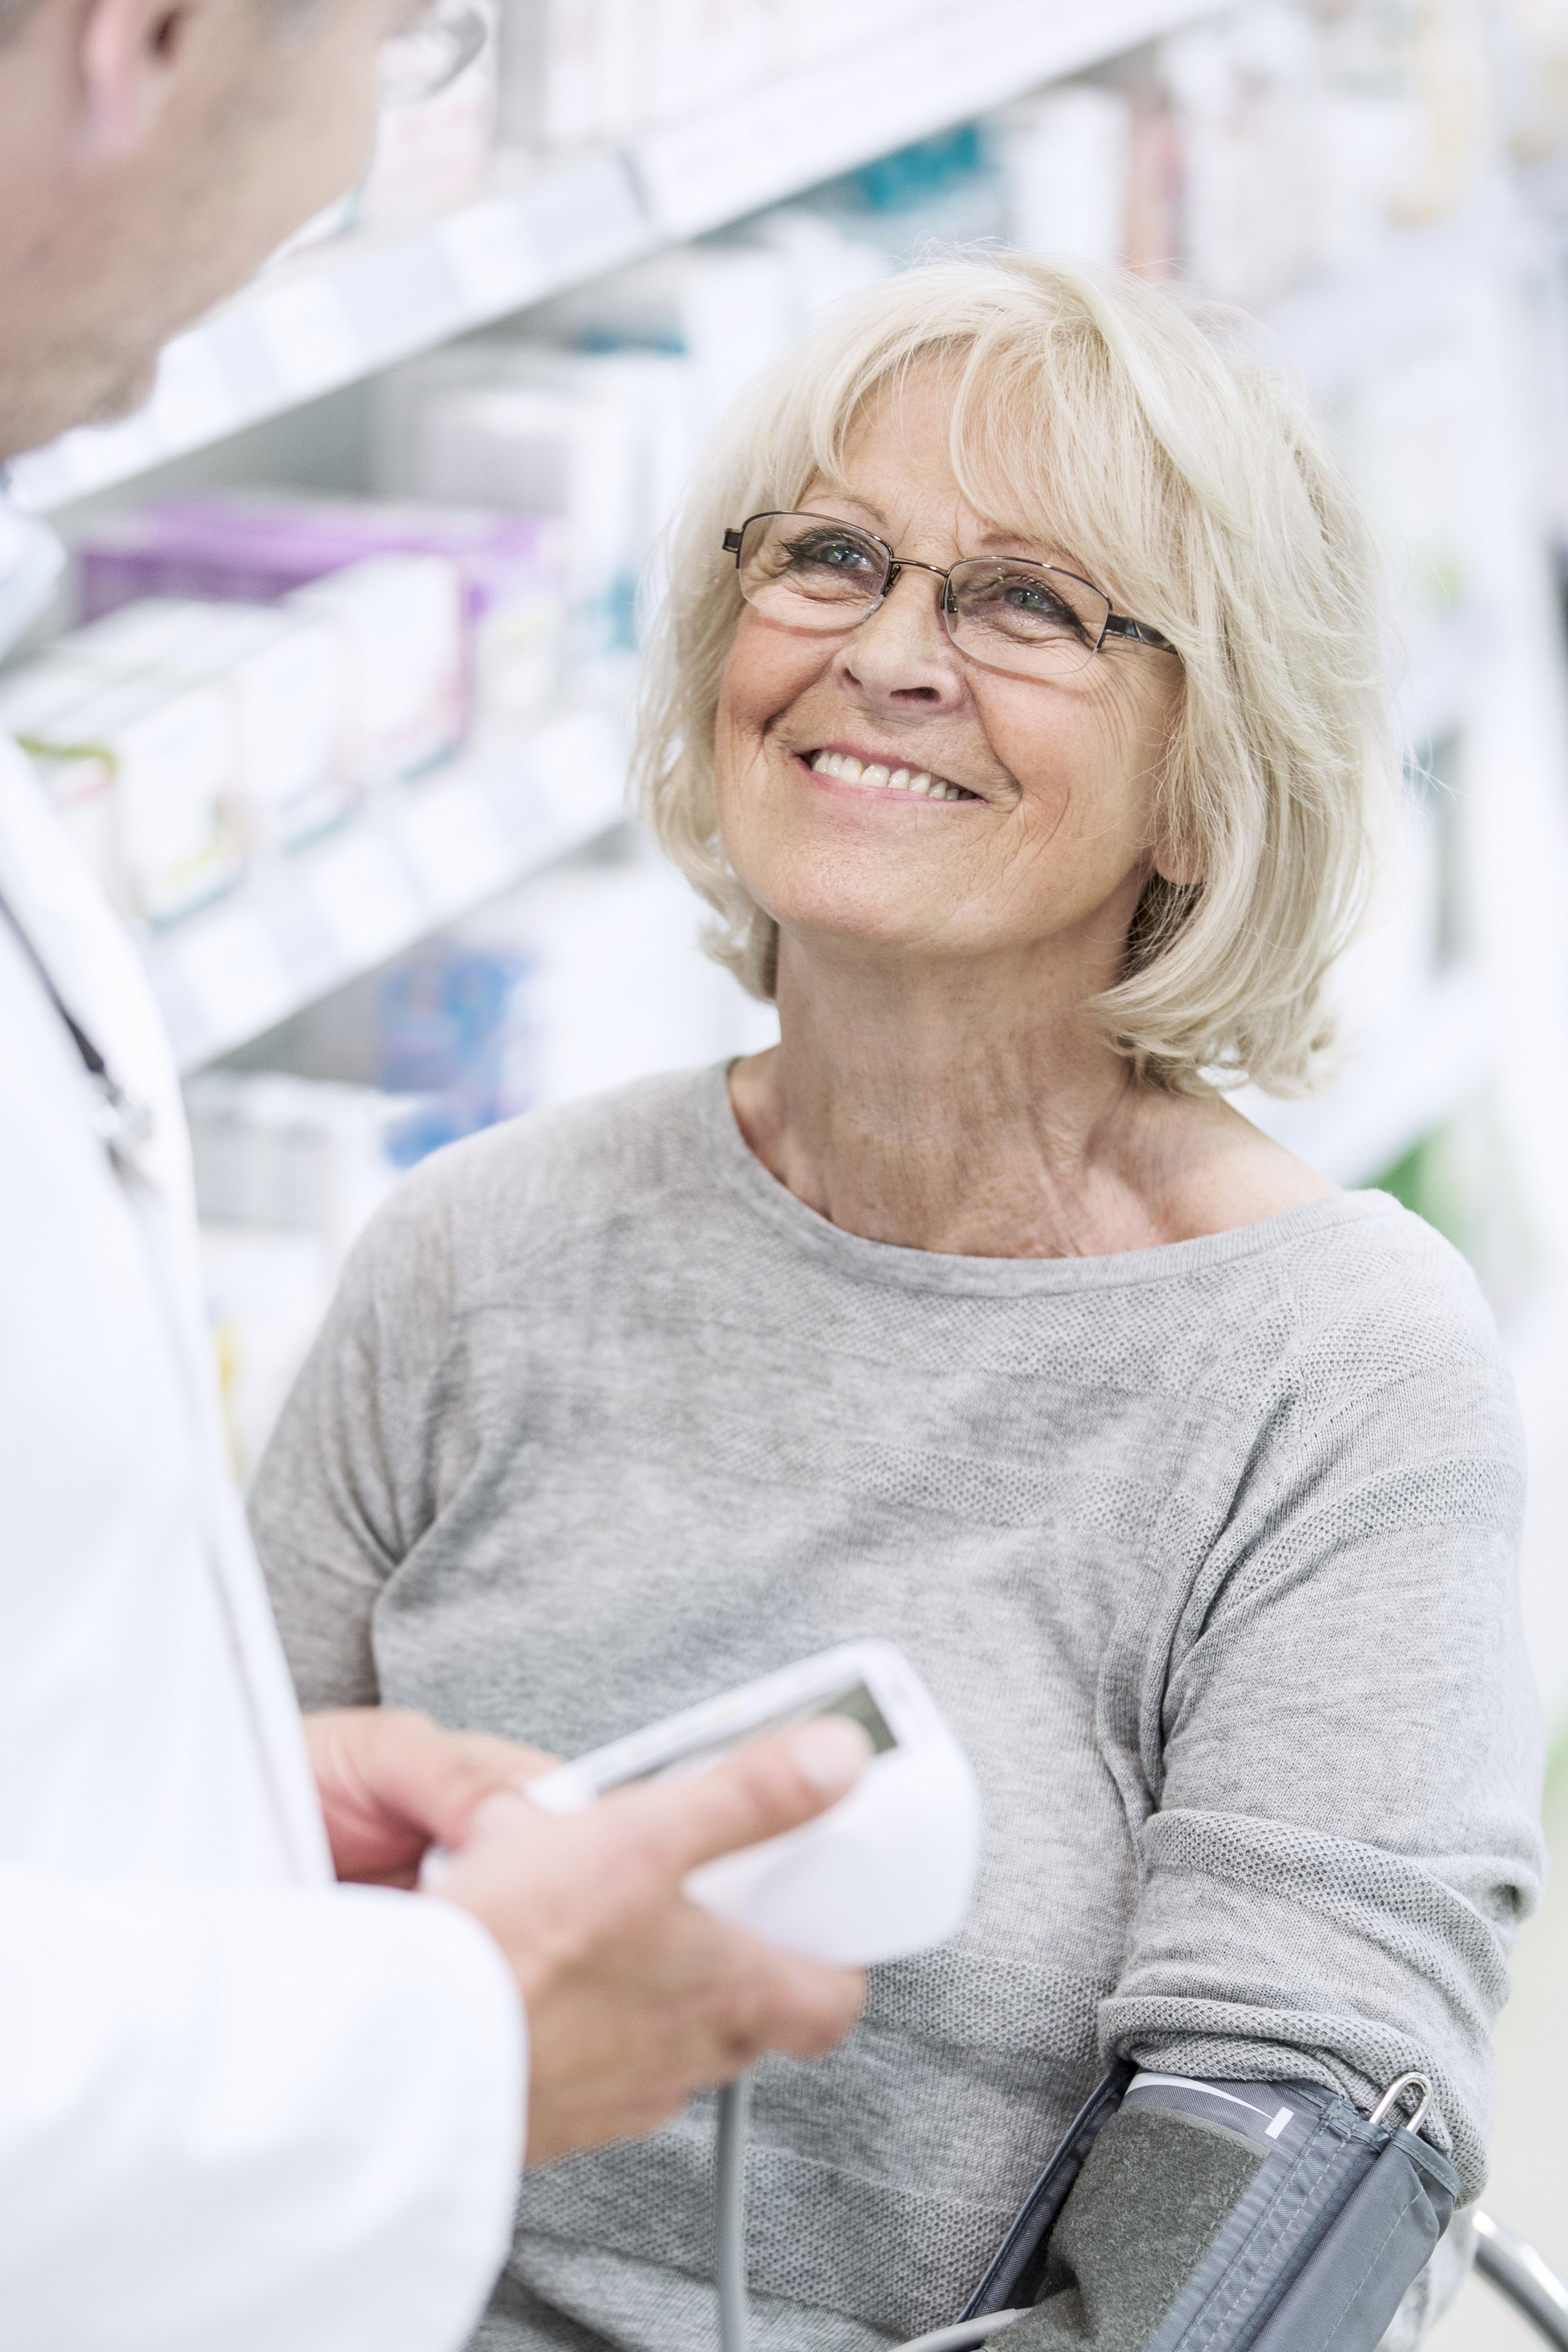 Ask a Pharmacist: Why Should I Use The Same Pharmacist Every Time?